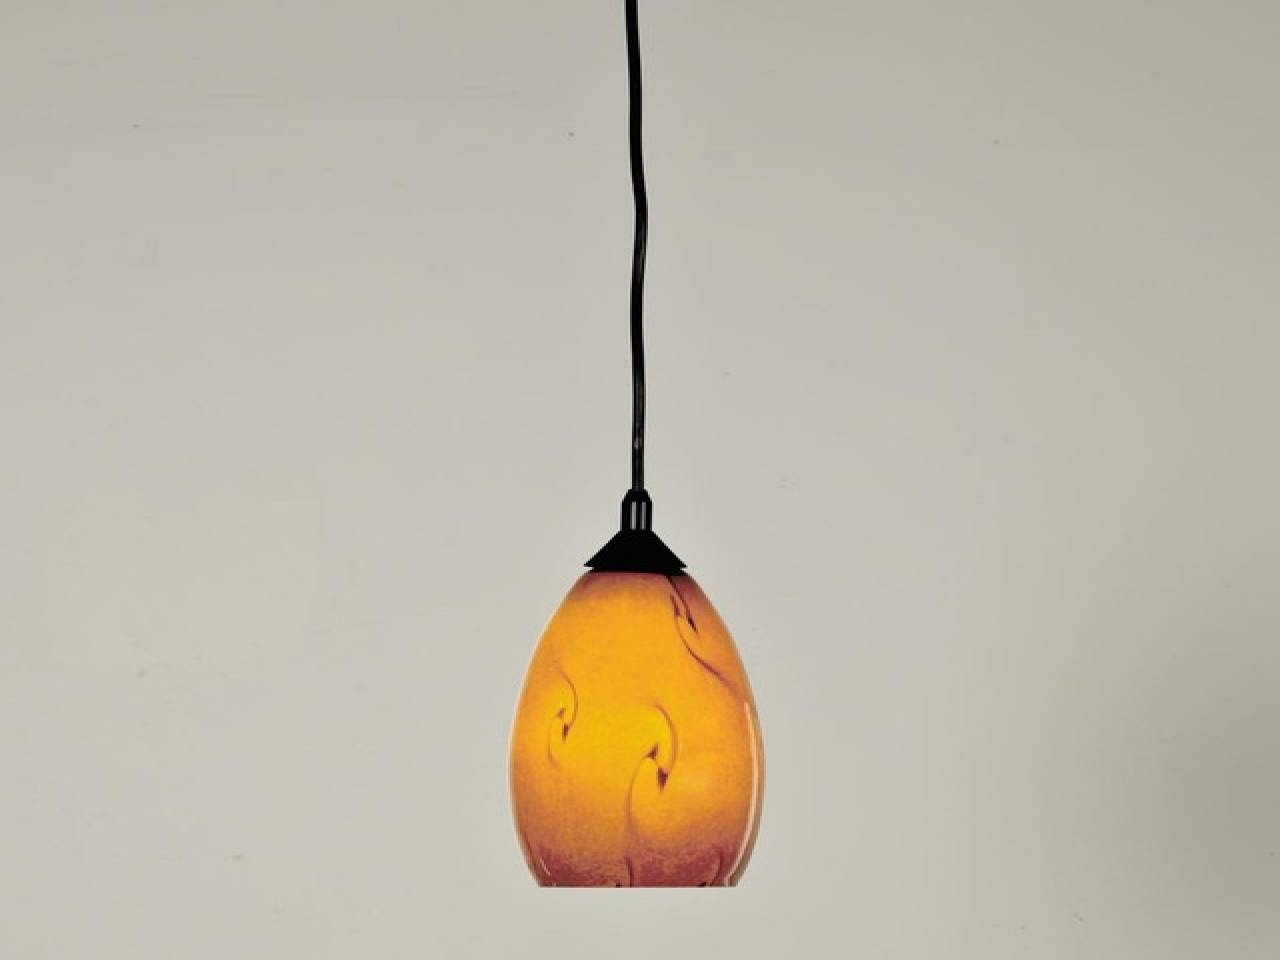 Astonishing Murano Glass Pendant Light 45 In Glass Pendant Lights Pertaining To Murano Glass Pendant Lights (View 6 of 15)